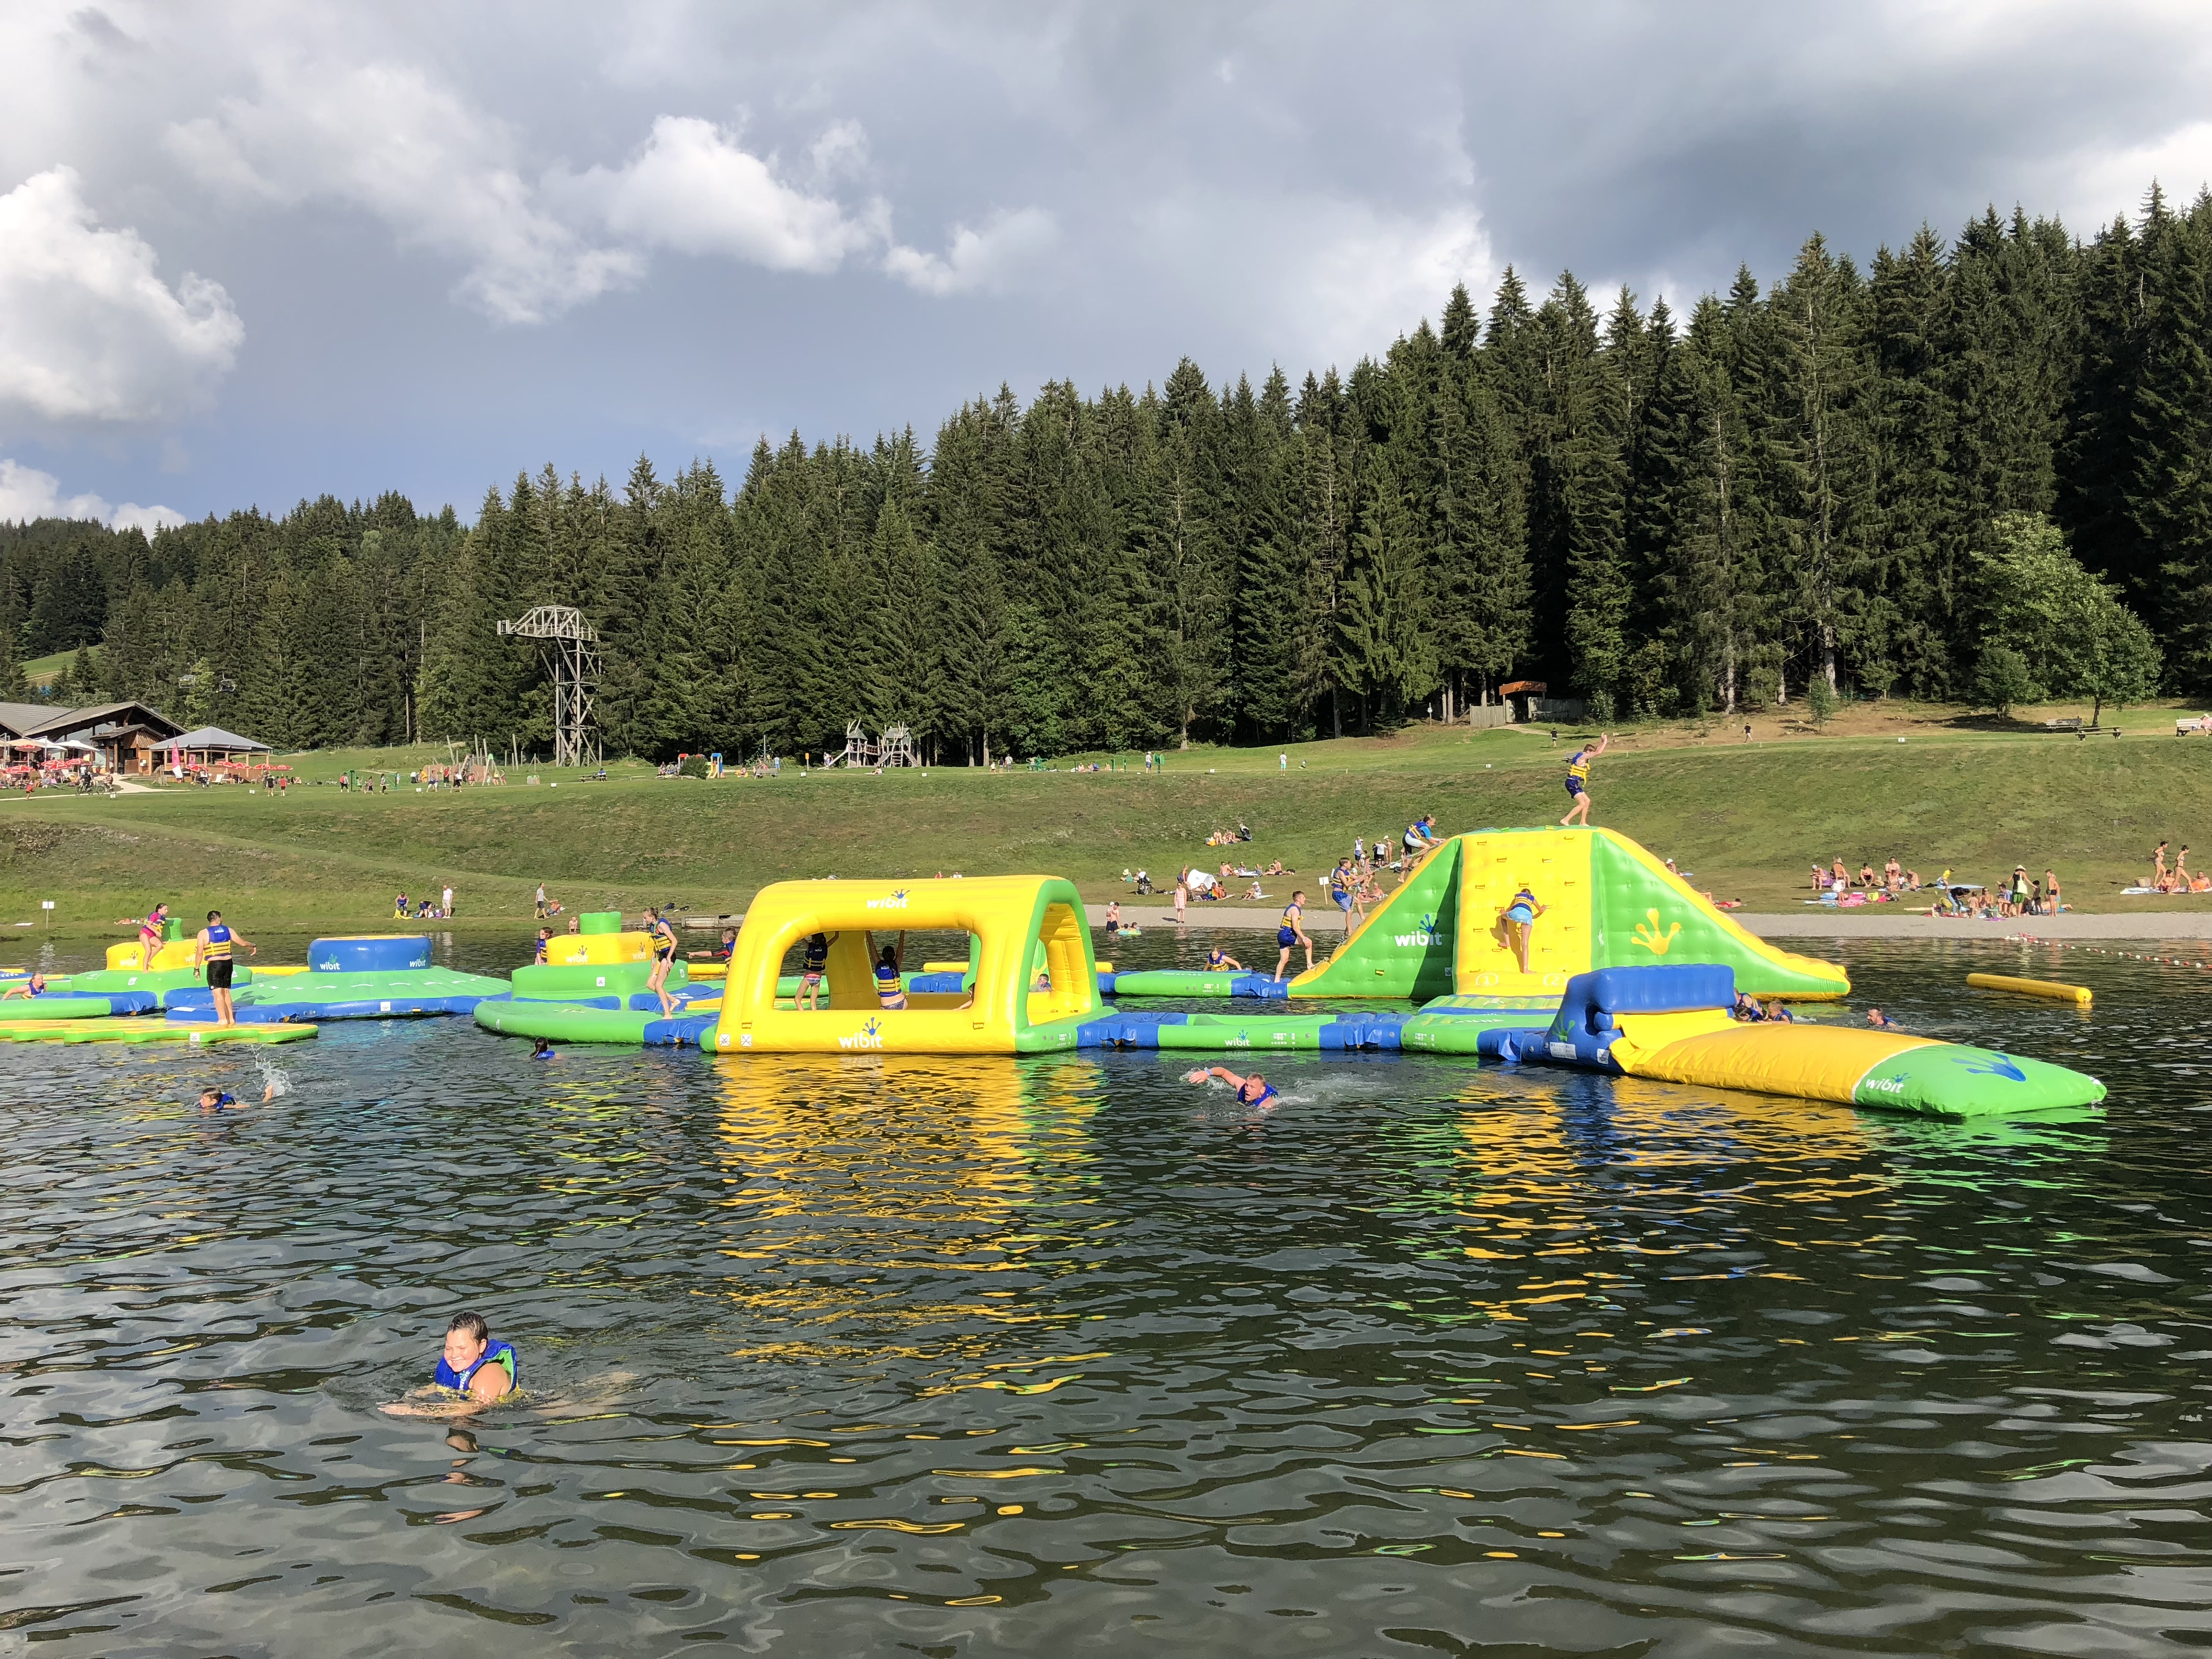 Webit on the lake